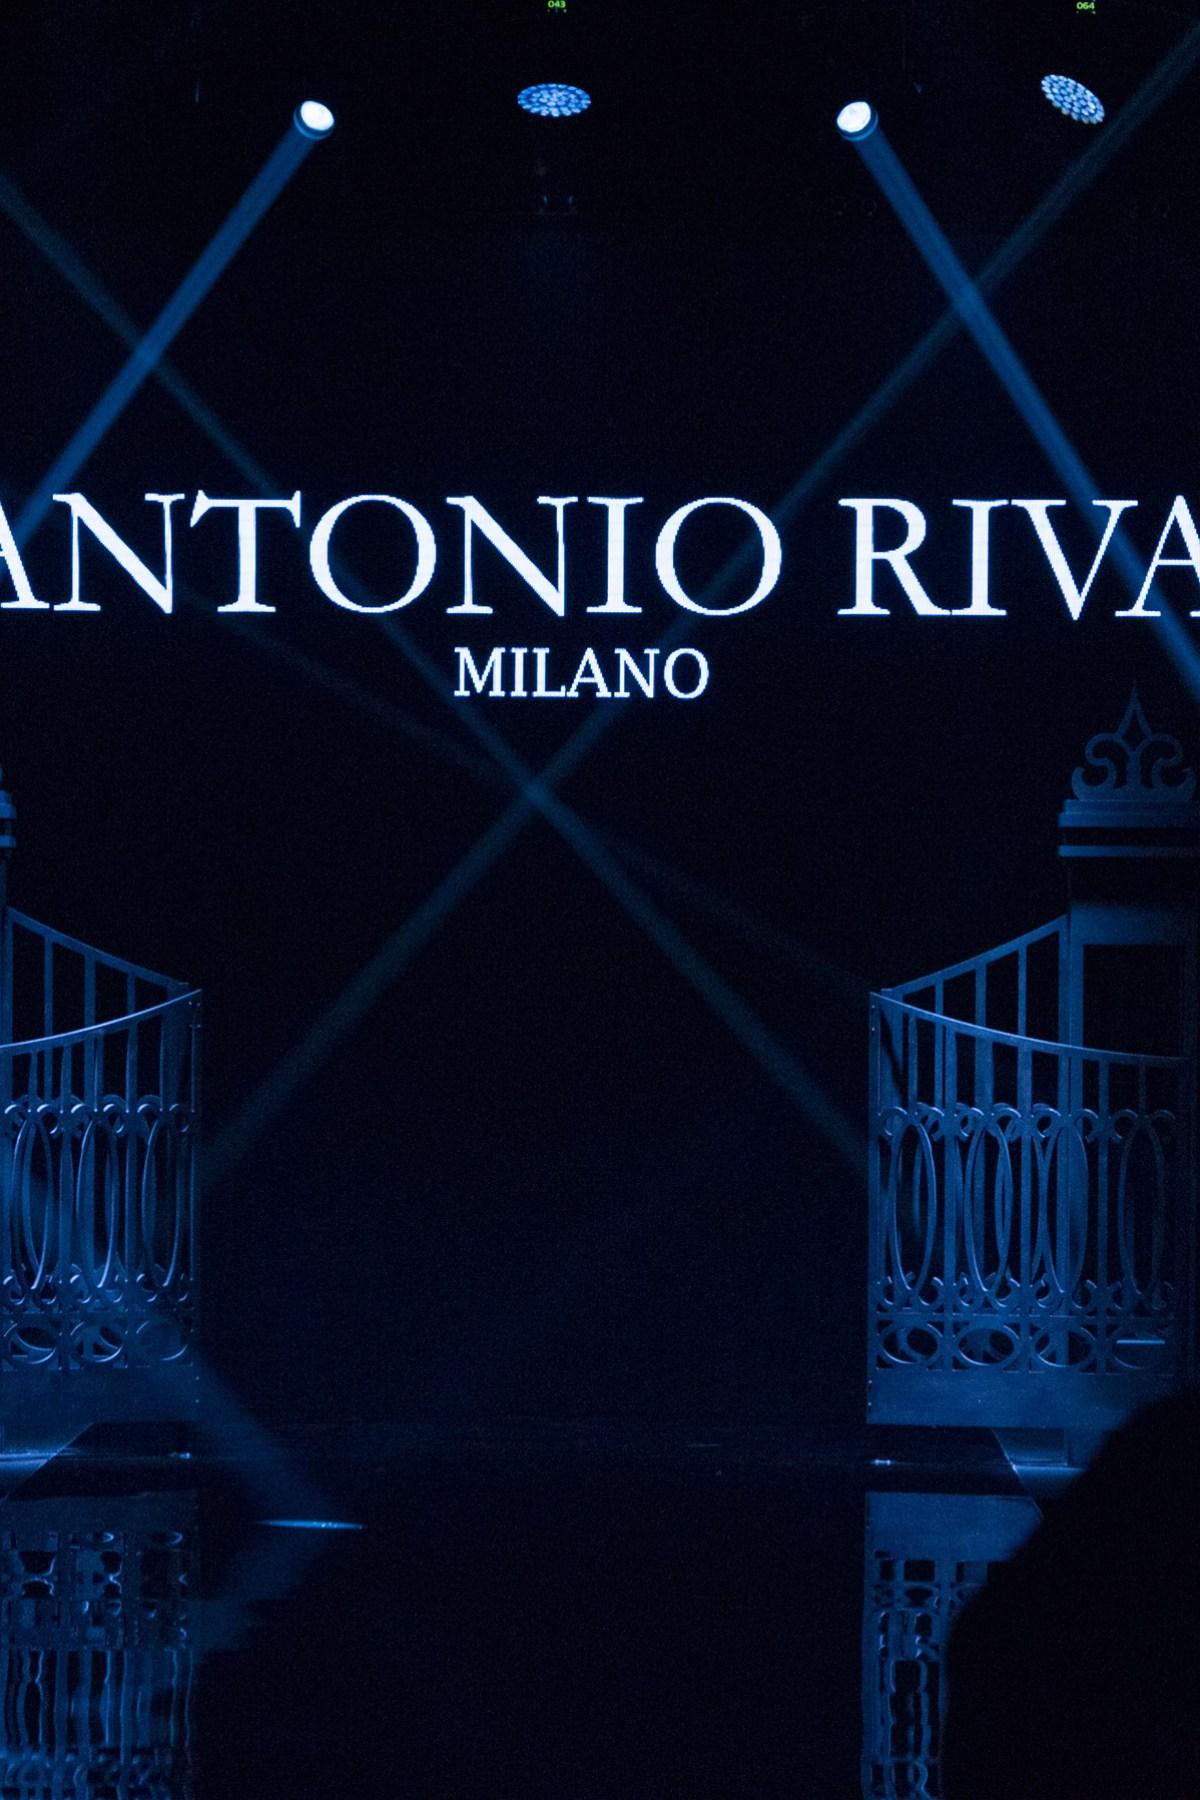 Antonio Riva brd RS17 0002